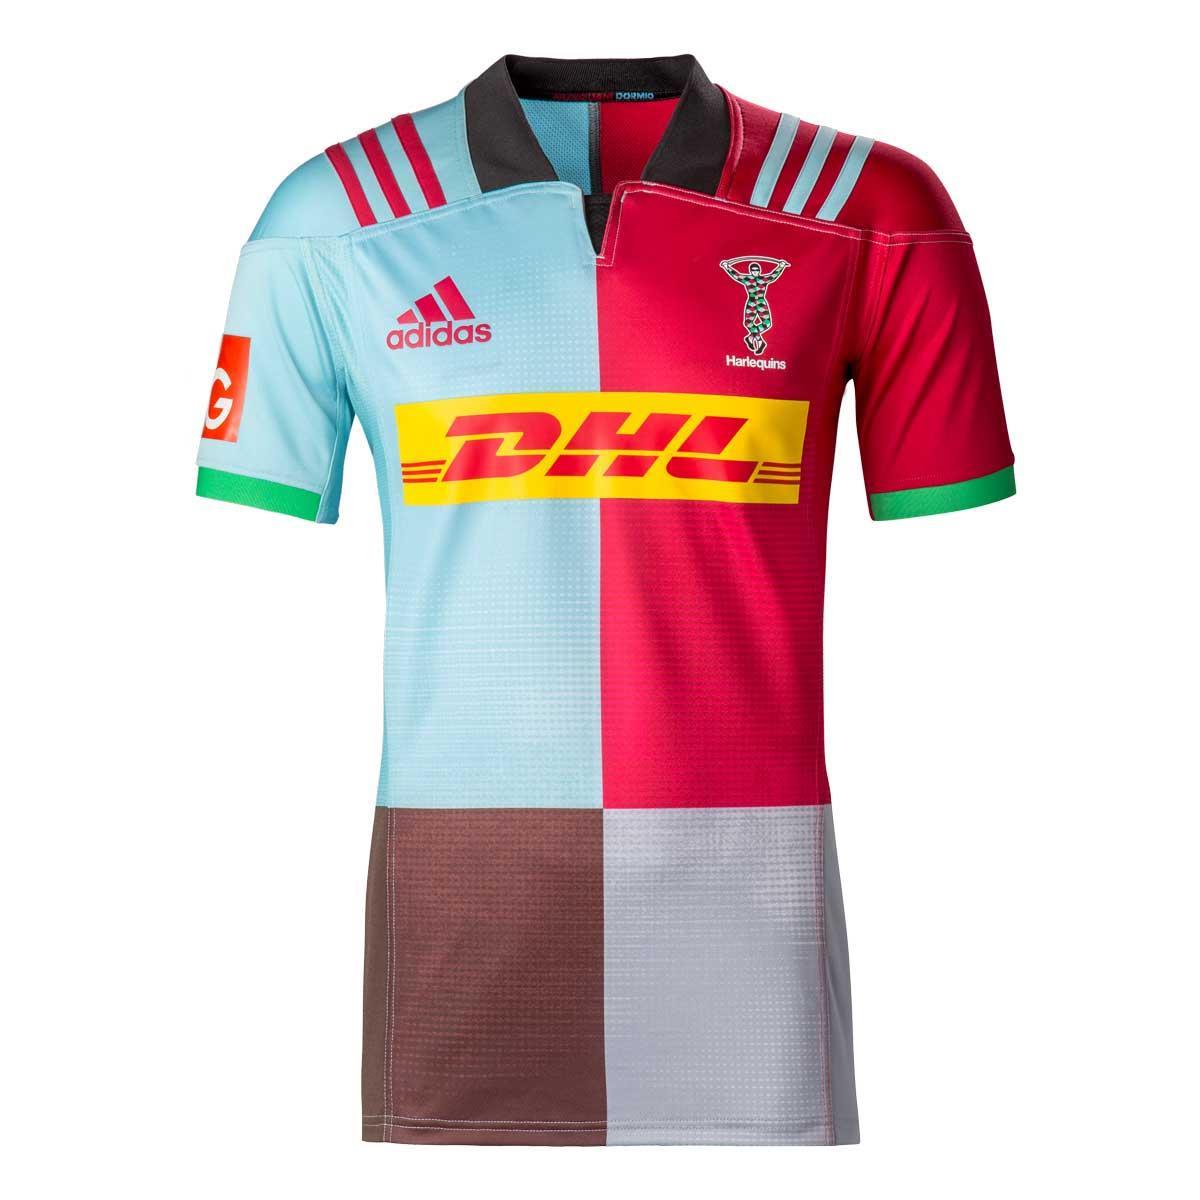 Design Rugby Shirt Uk